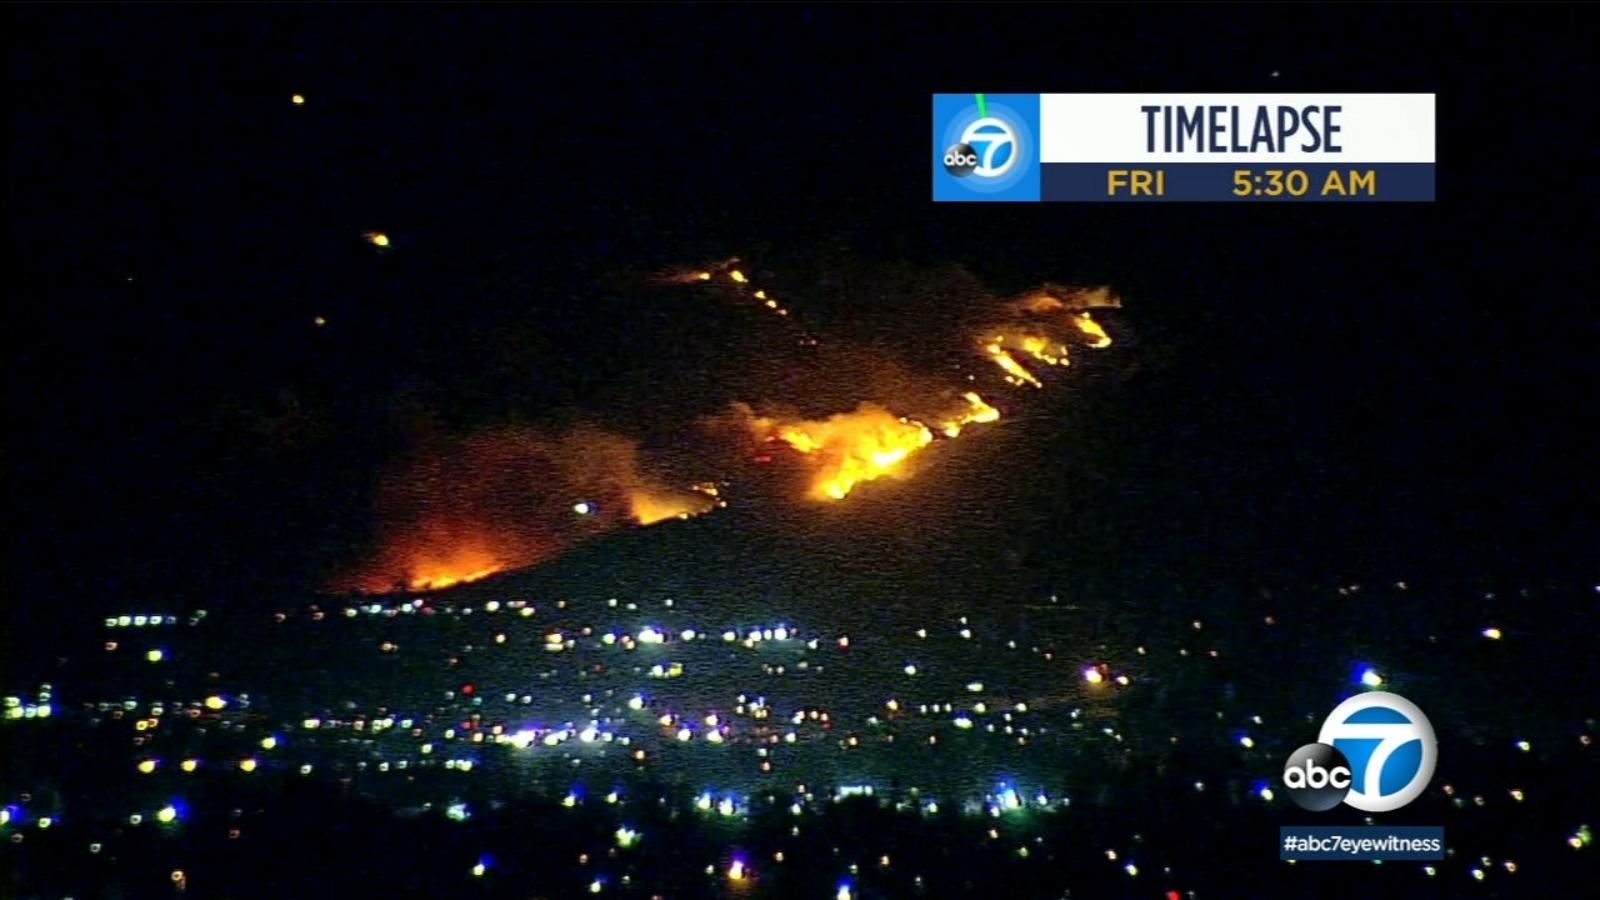 Saddleridge Fire Time lapse shows fast moving blaze burning ...